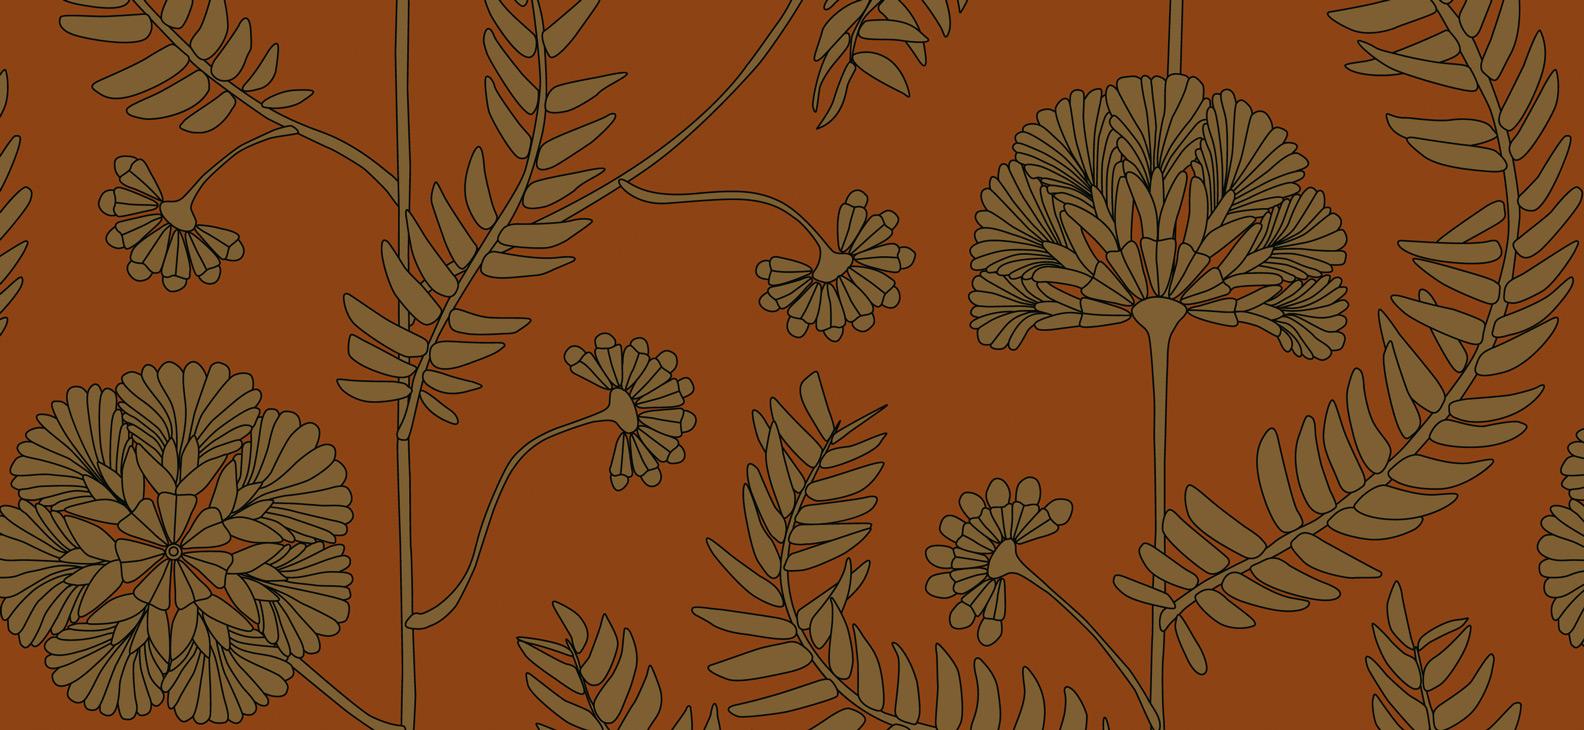 Papier Peint Ressource, Collection Faune & Flore, Motif Anna, Variation AA05